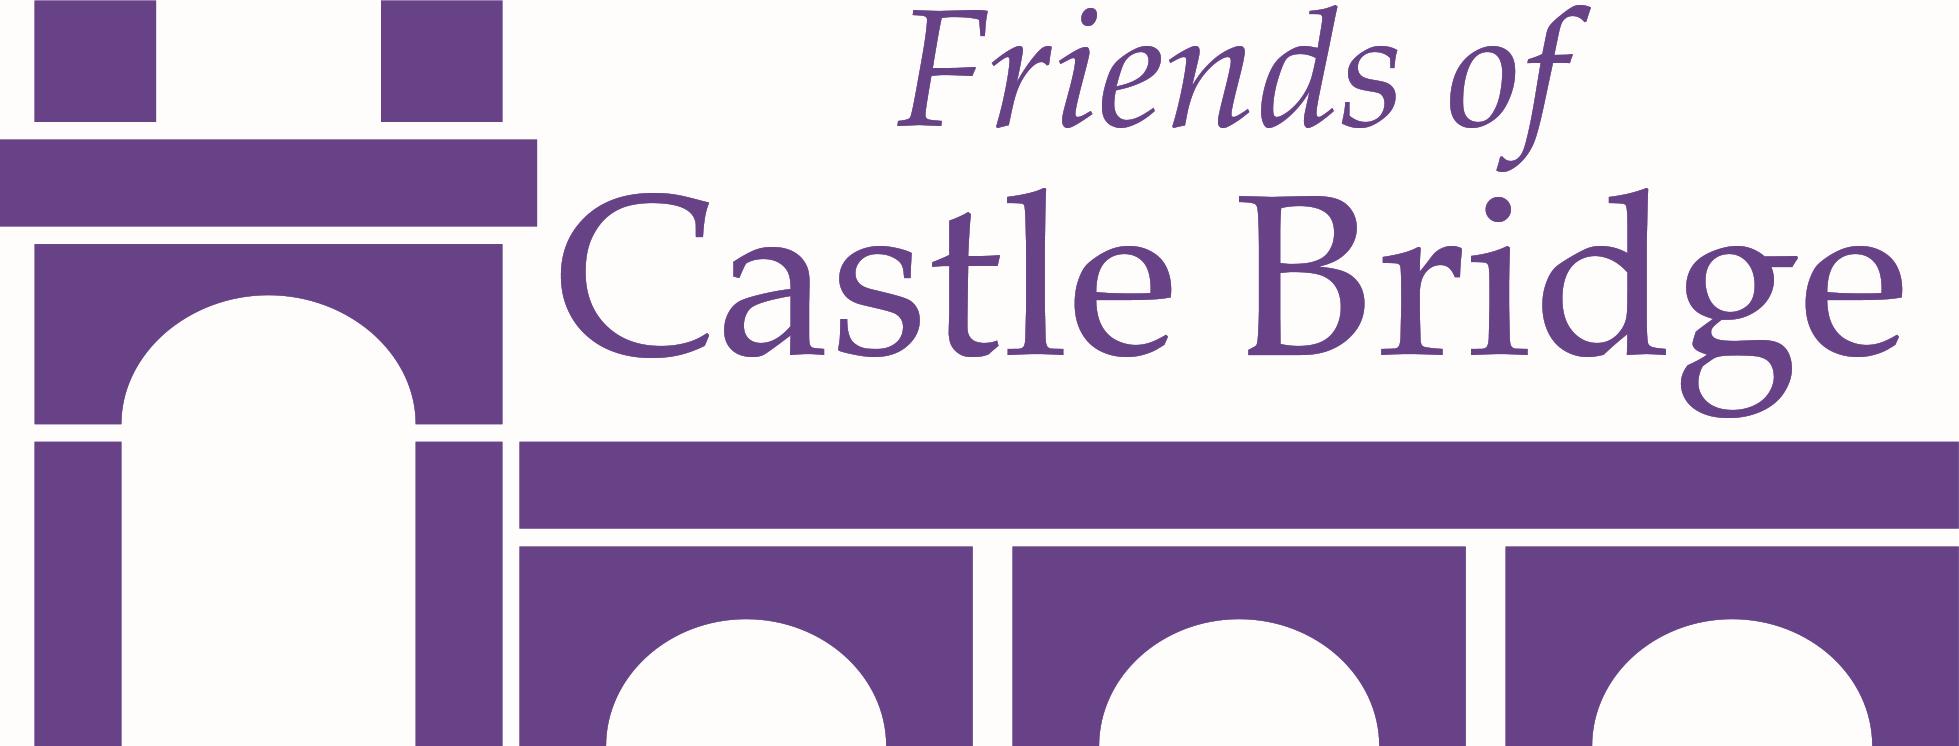 Friends of Castle Bridge Logo